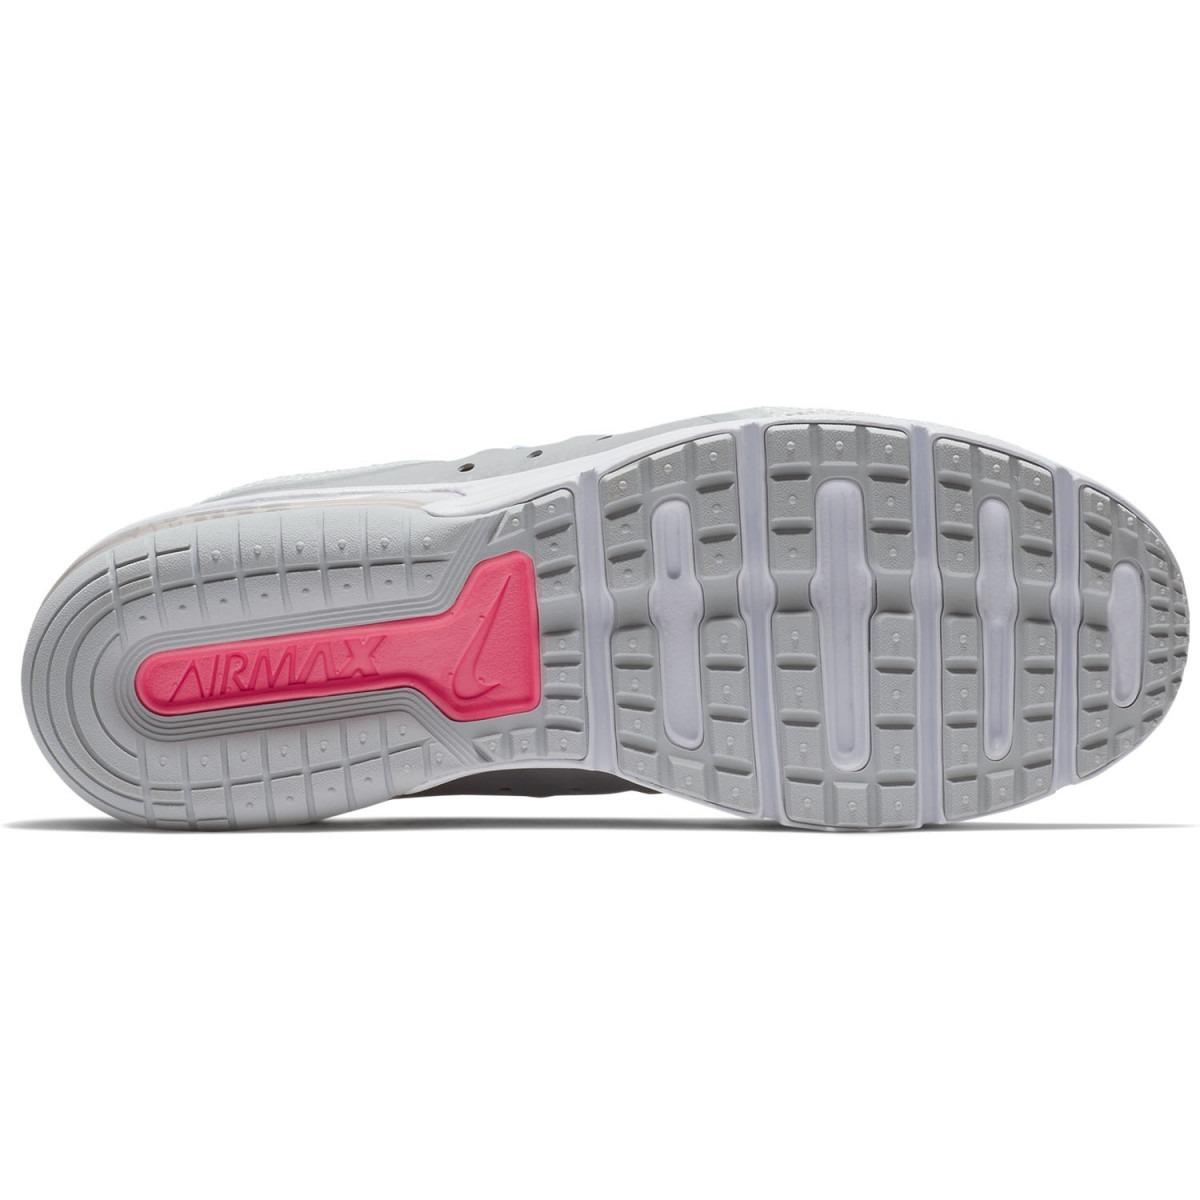 39d39200b8a zapatillas nike wmns air max sequent 3 para mujer oferta. Cargando zoom.